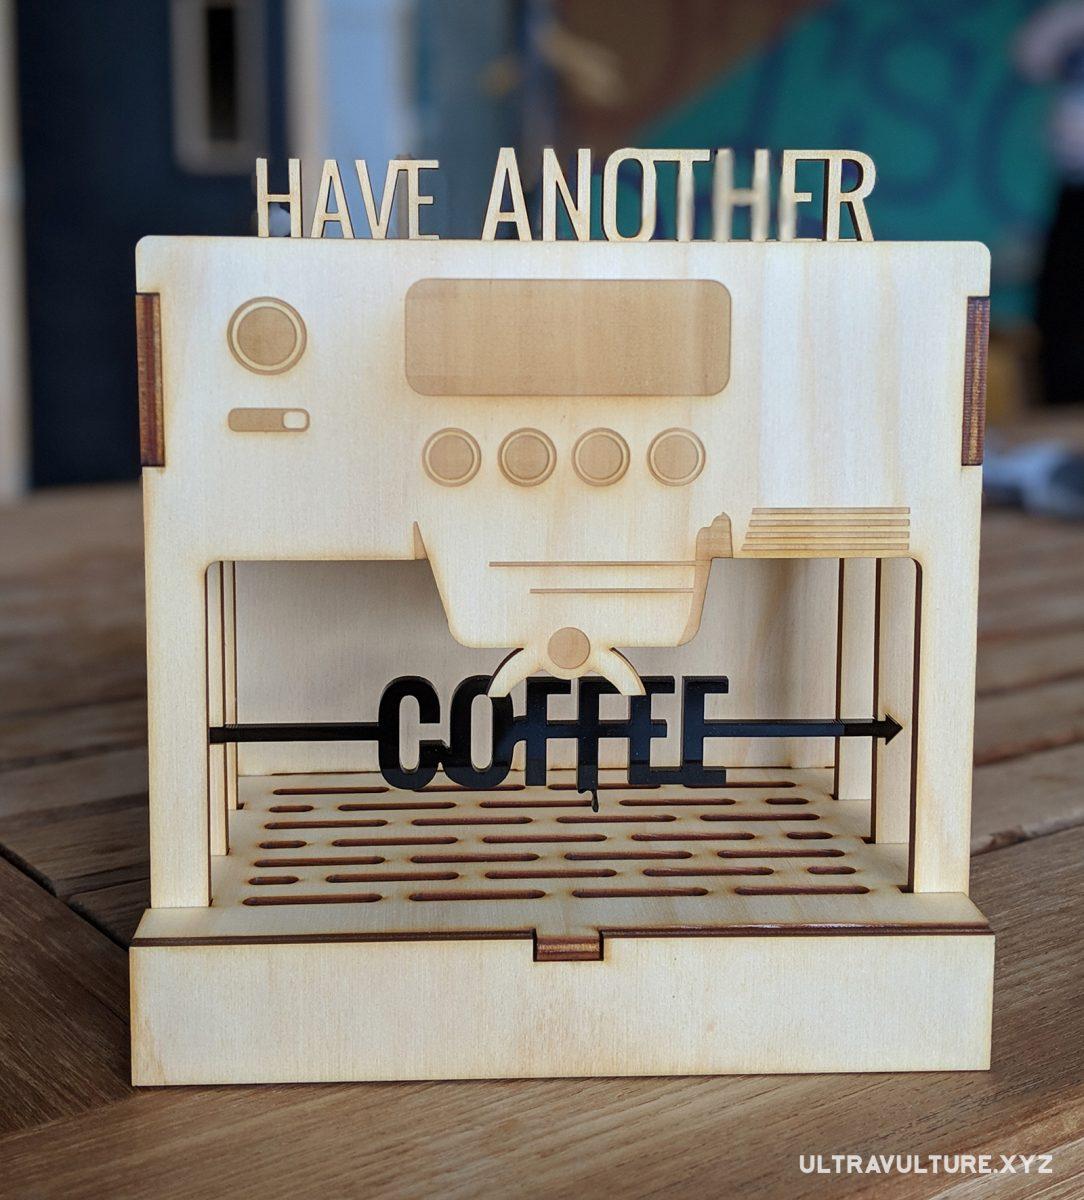 Espresso machine sculpture